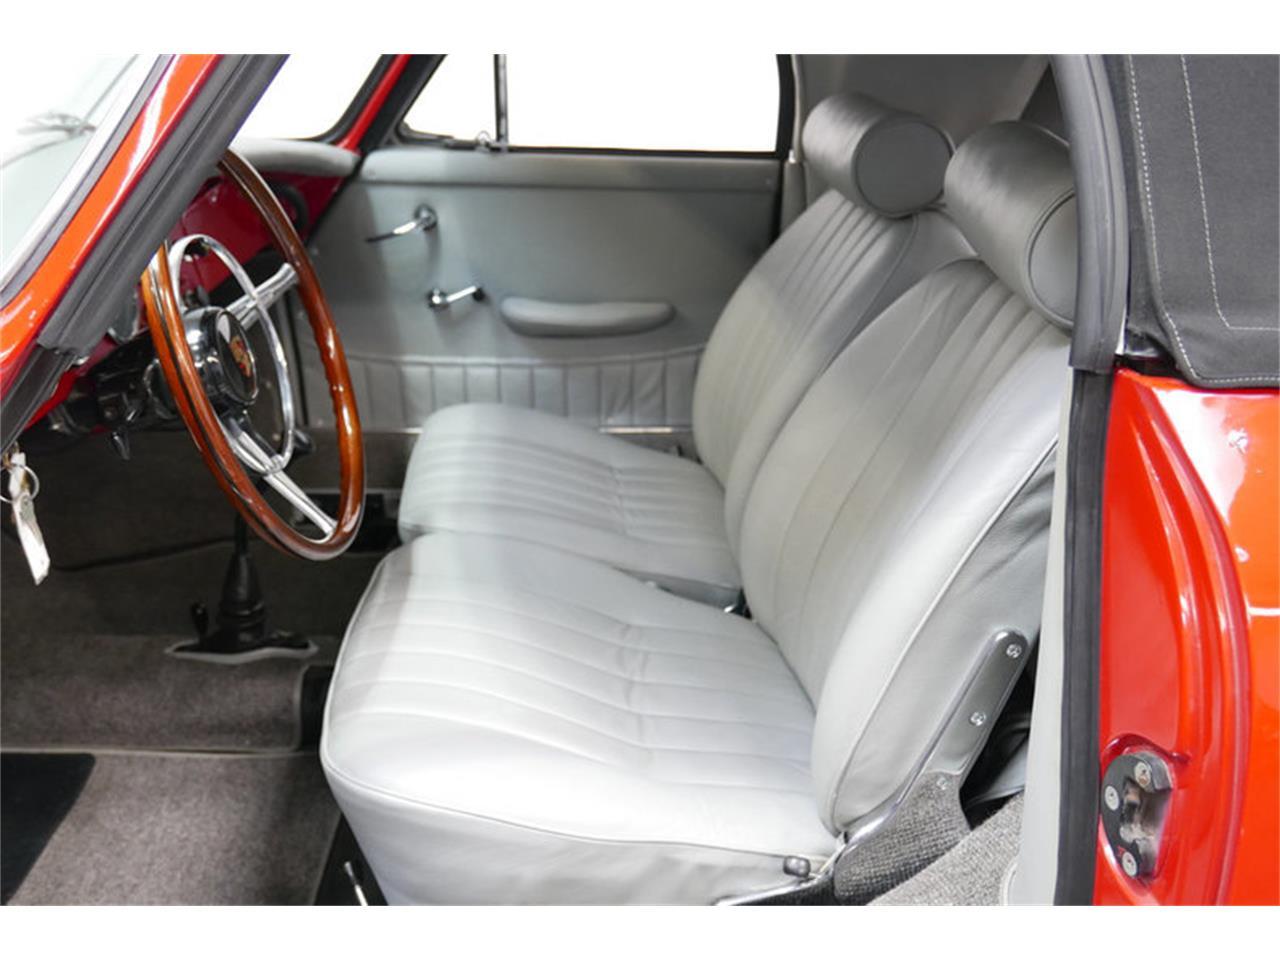 Large Picture of '65 Porsche 356SC located in Costa Mesa California - $199,500.00 - MOD2